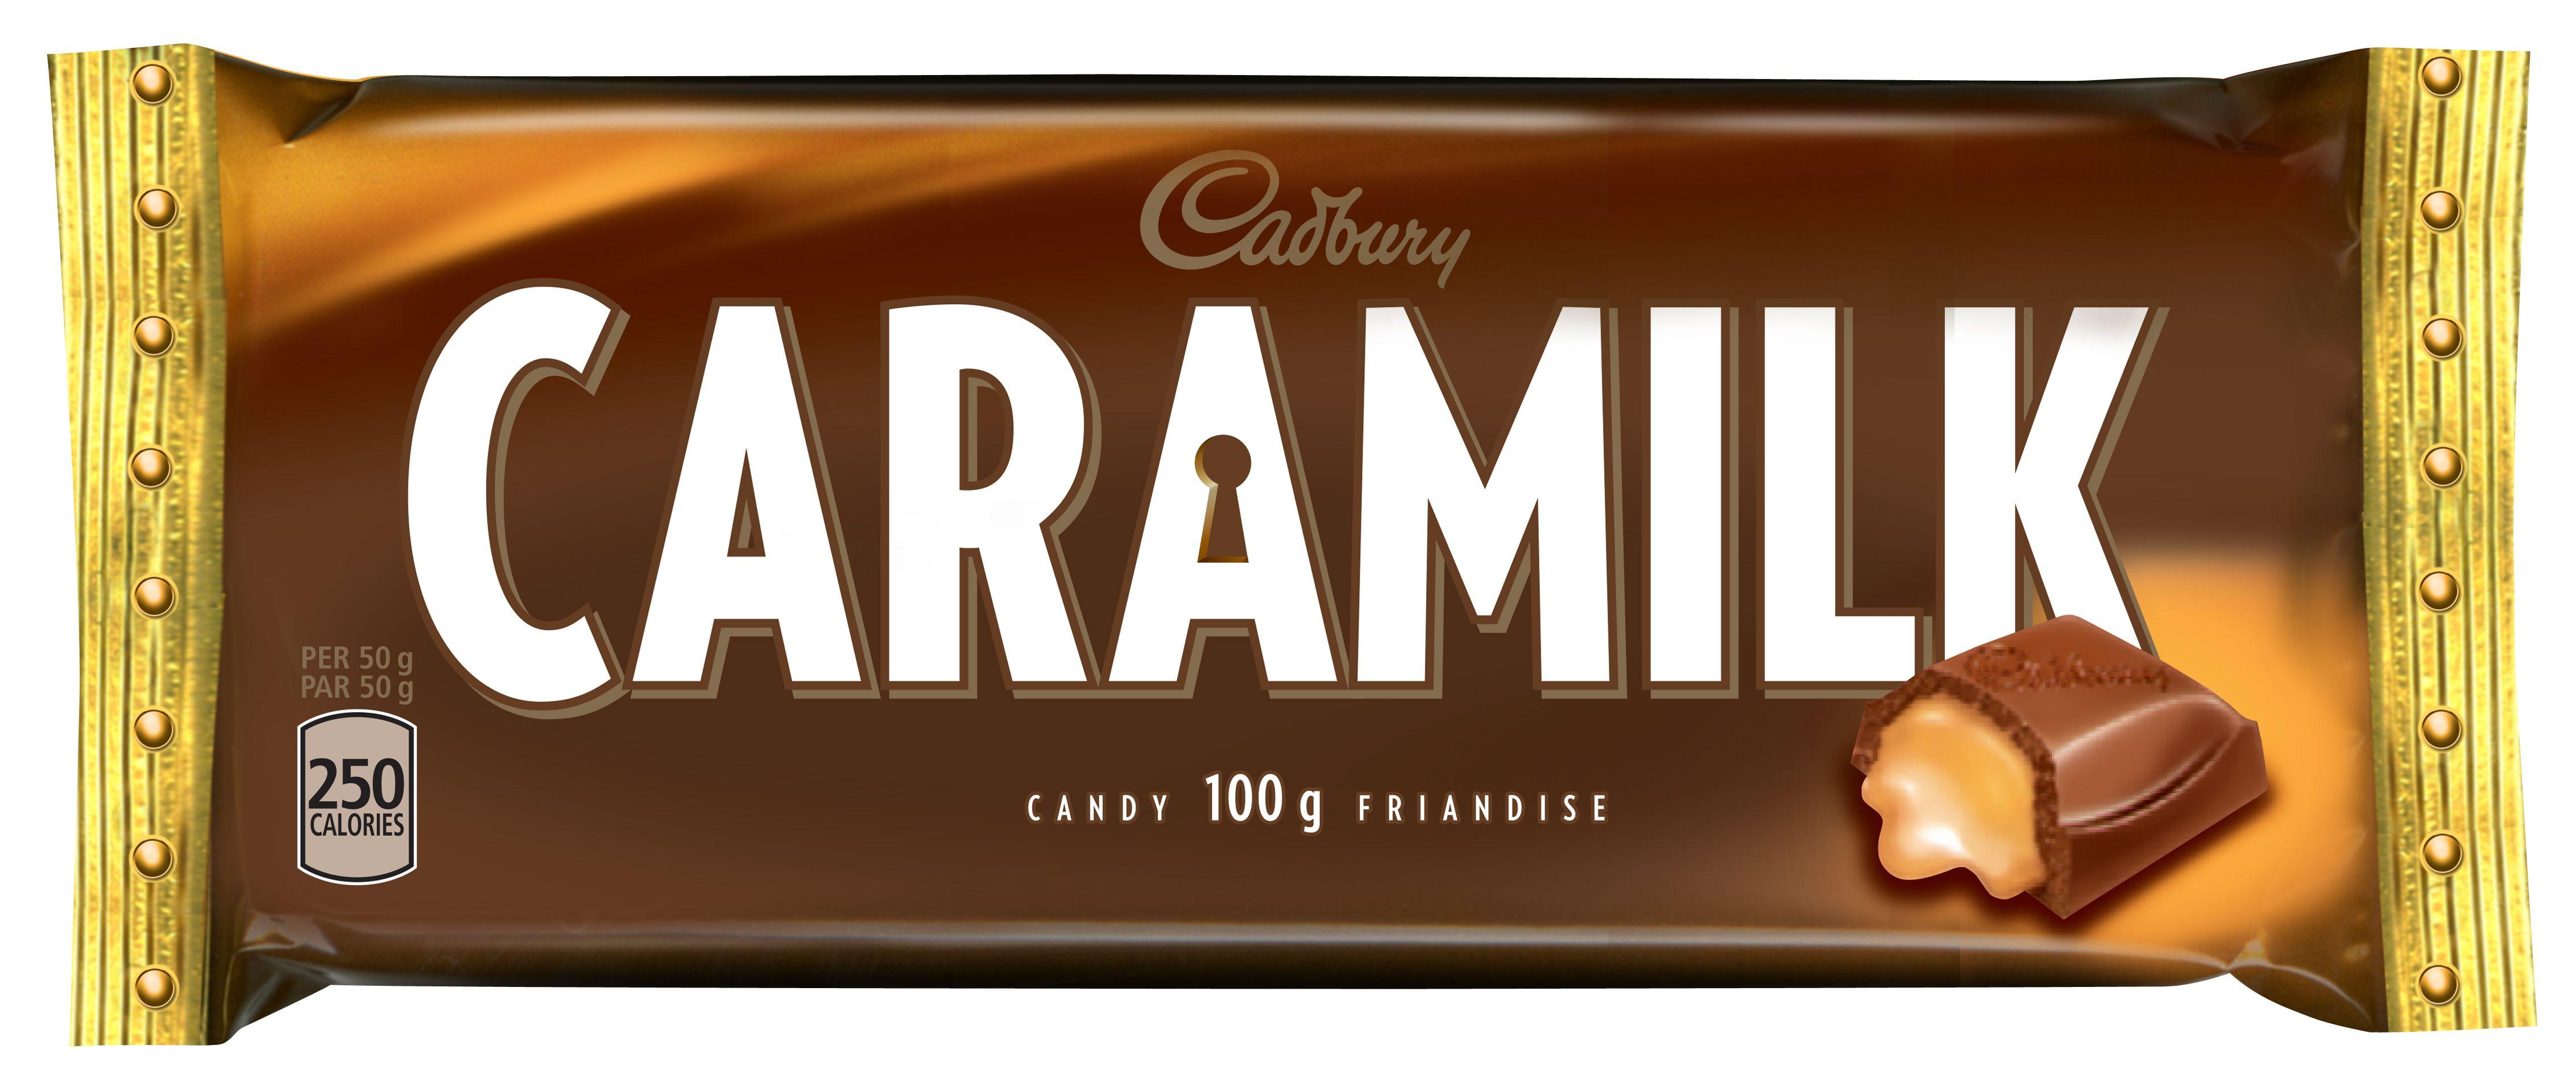 Caramilk Original Chocolate Bar 100 G